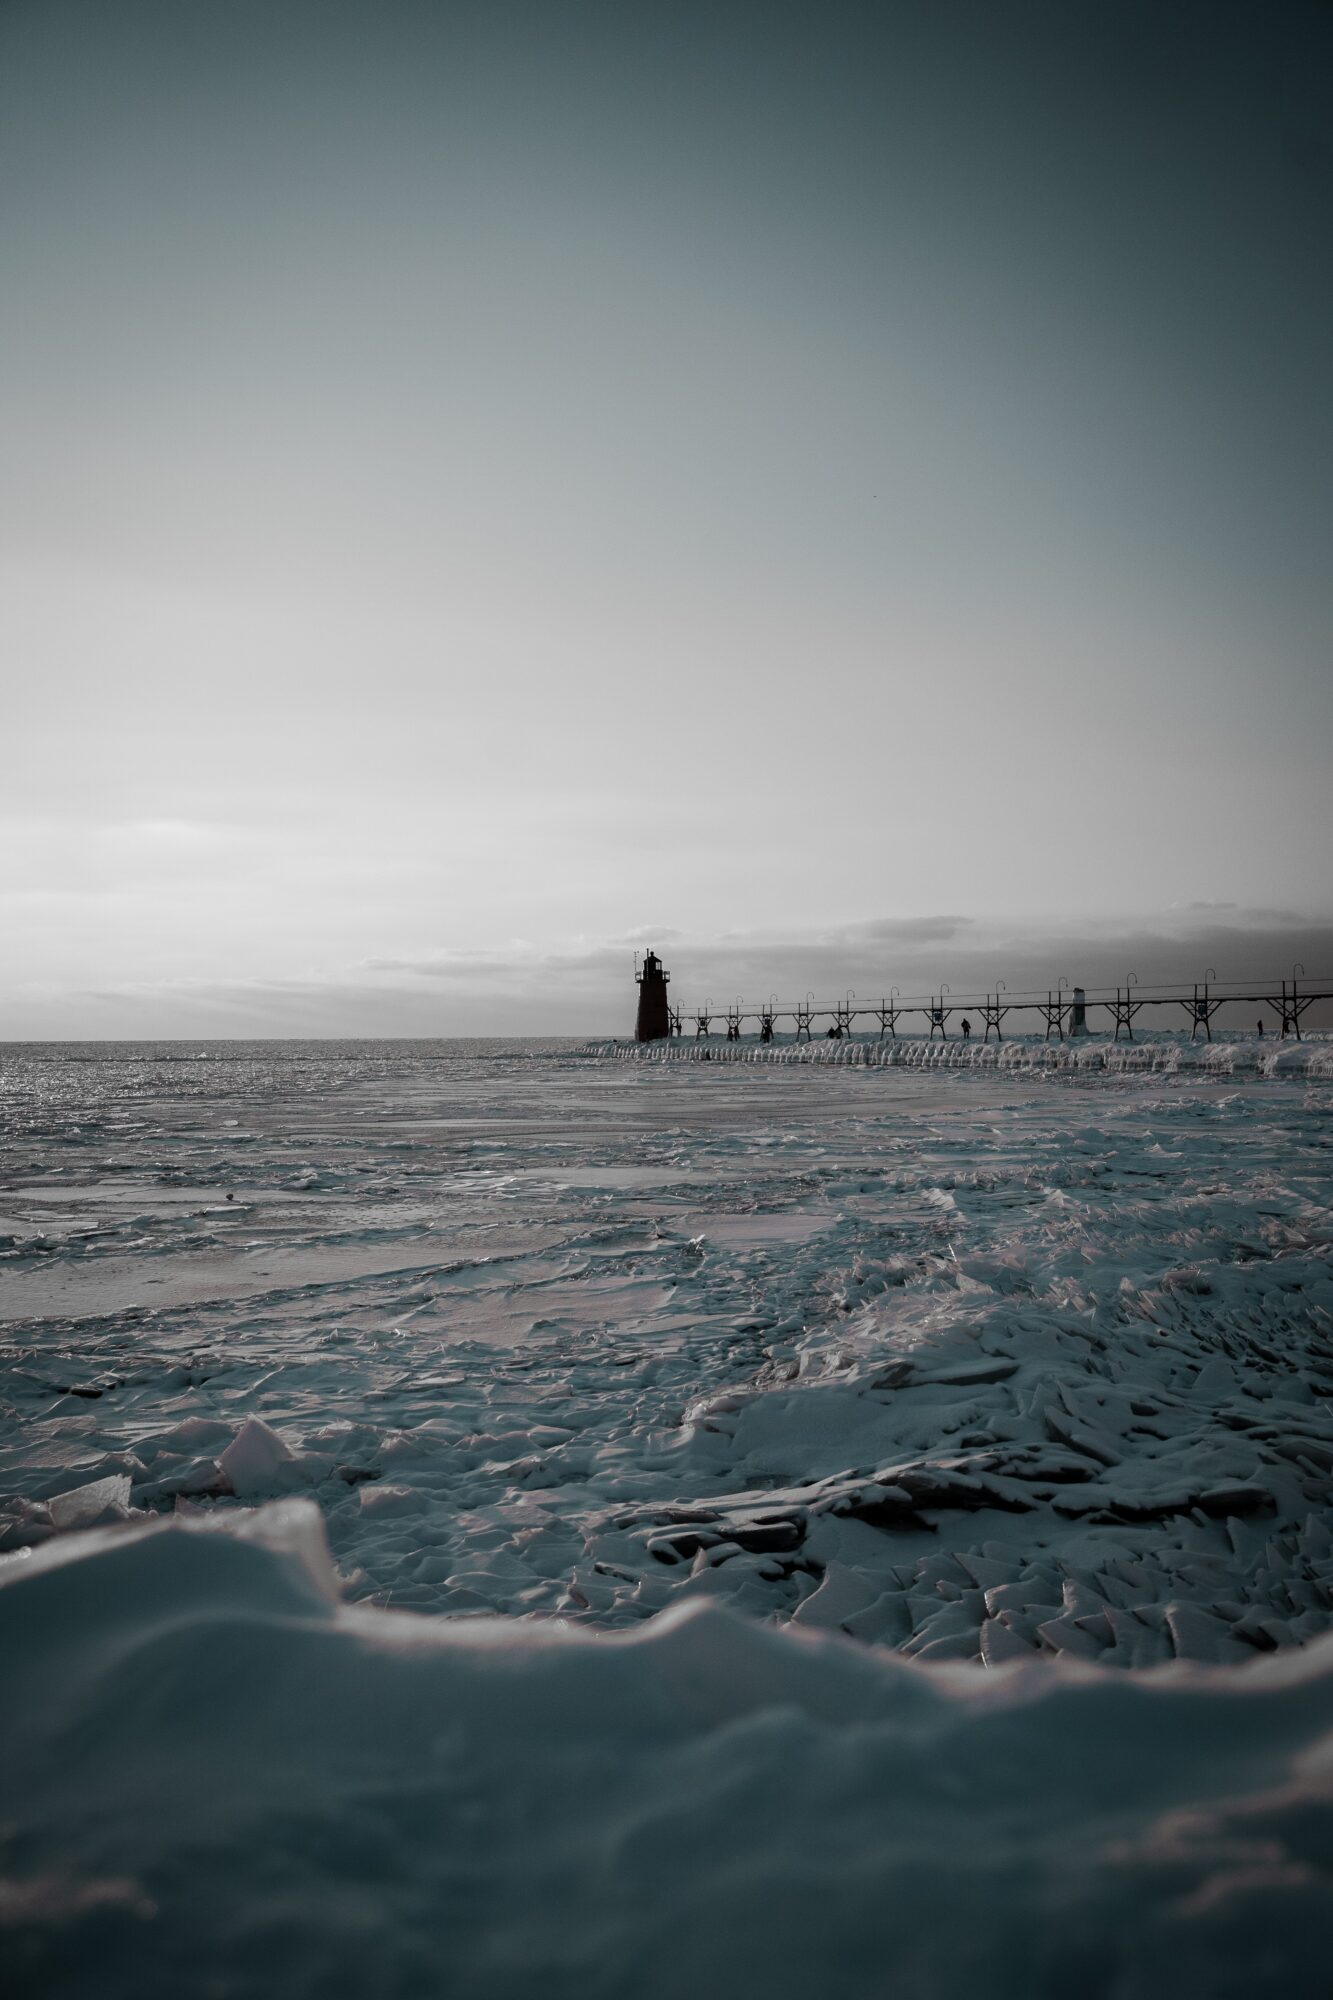 Winter view in Michigan for boat winterization at Leelanau Boat Co